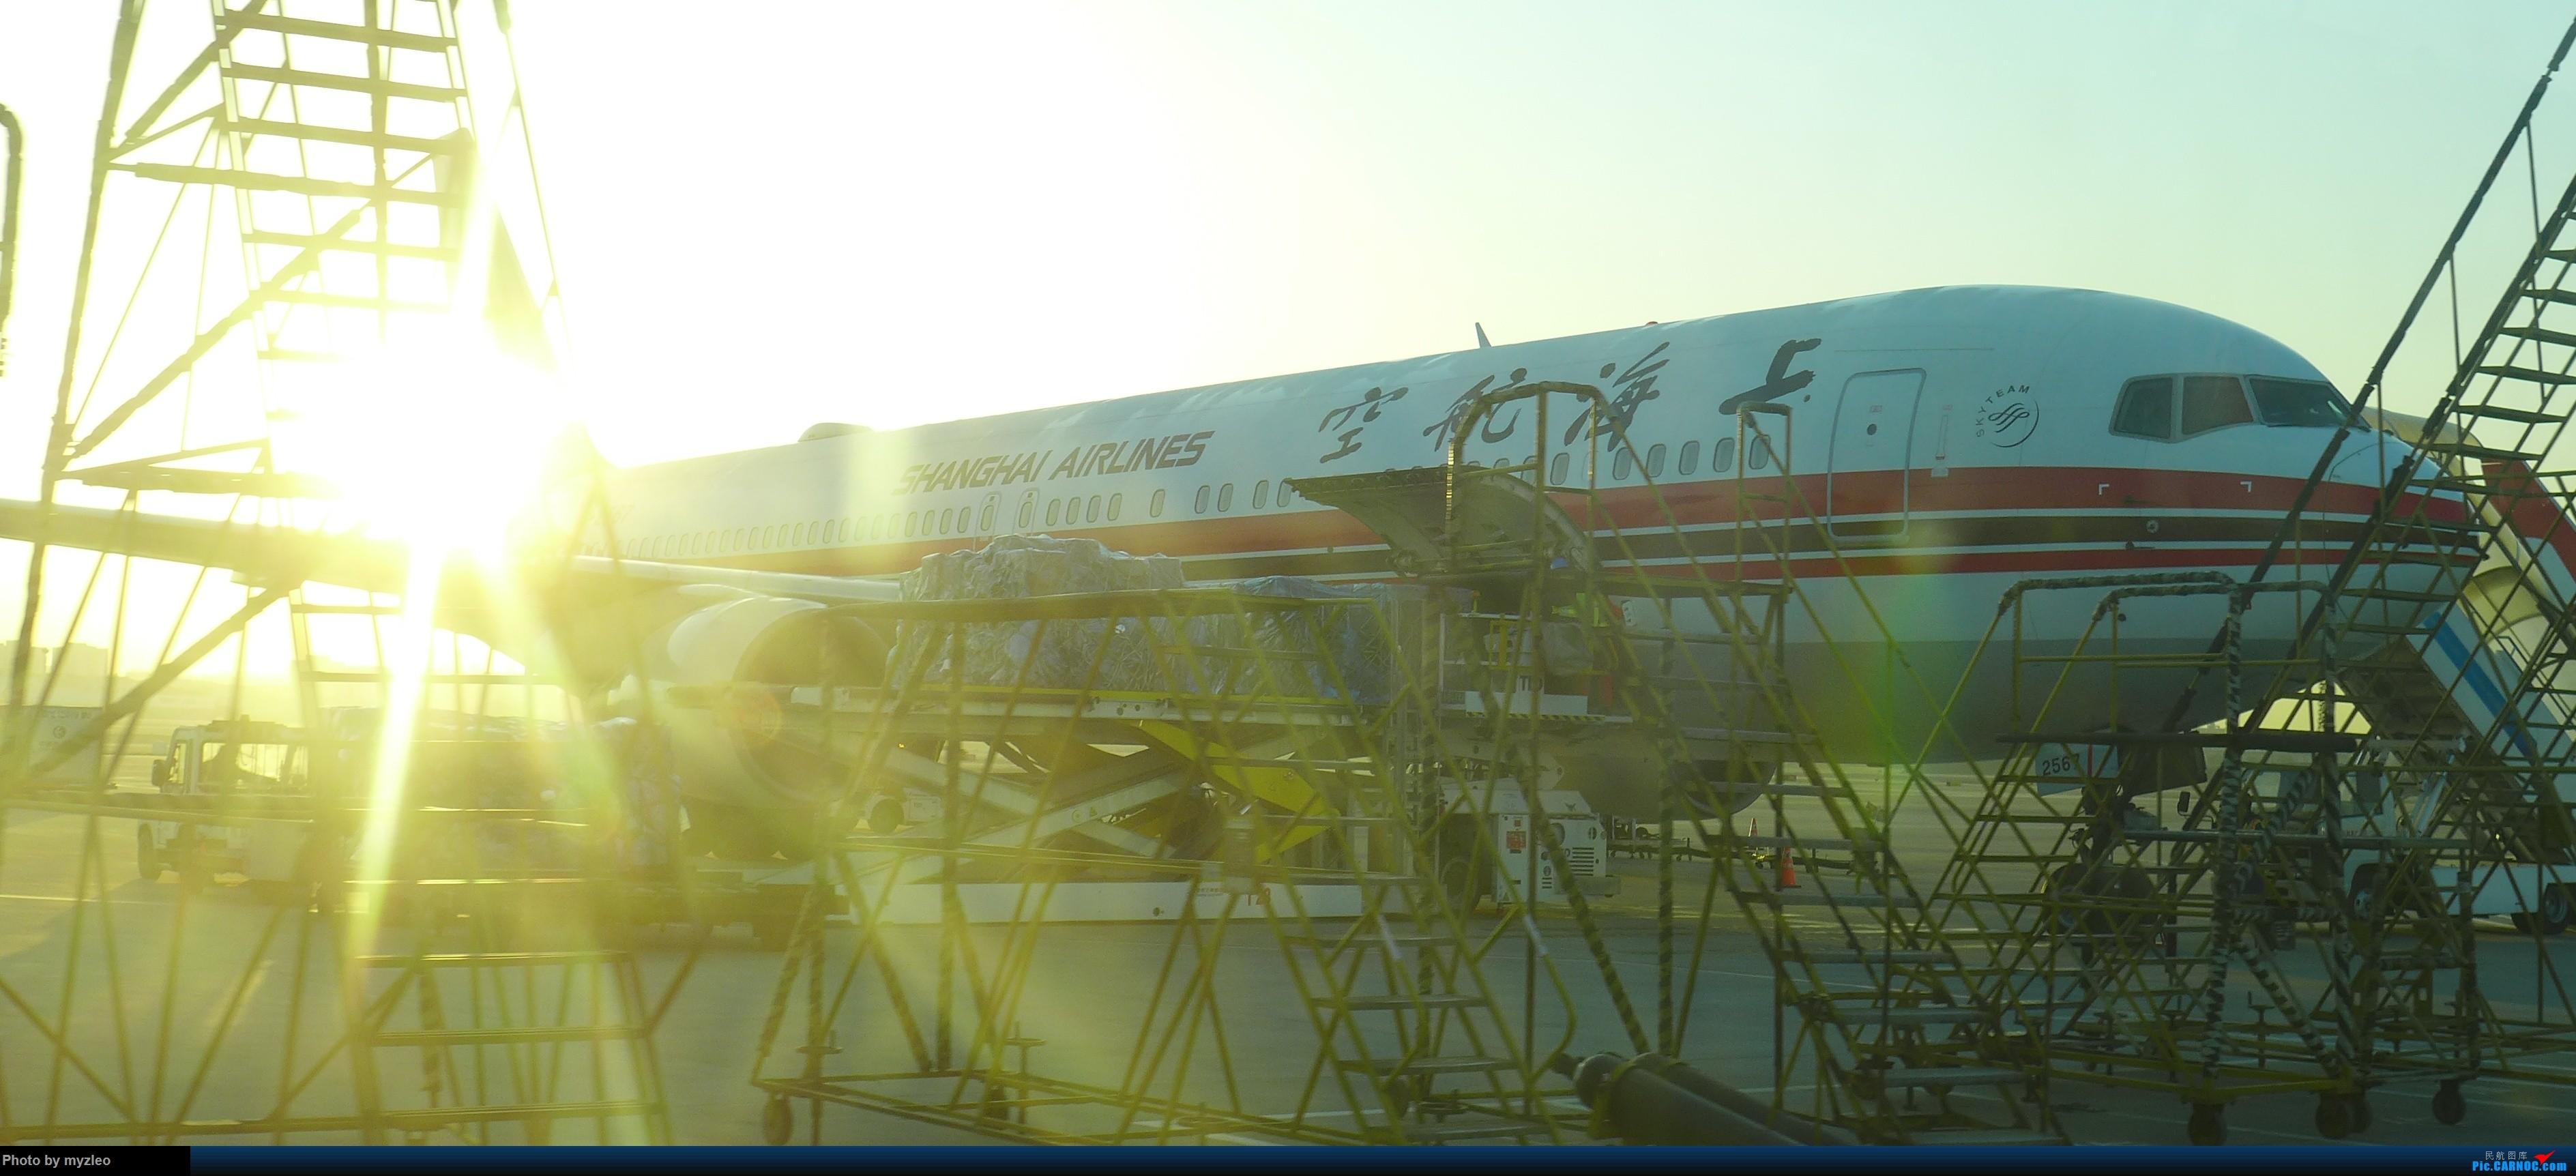 Re:[原创]【myzleo的游记1】六天五晚广州行——SHA-CAN上航商务舱初体验+广州城内 BOEING 767-300 B-2567 中国上海虹桥国际机场